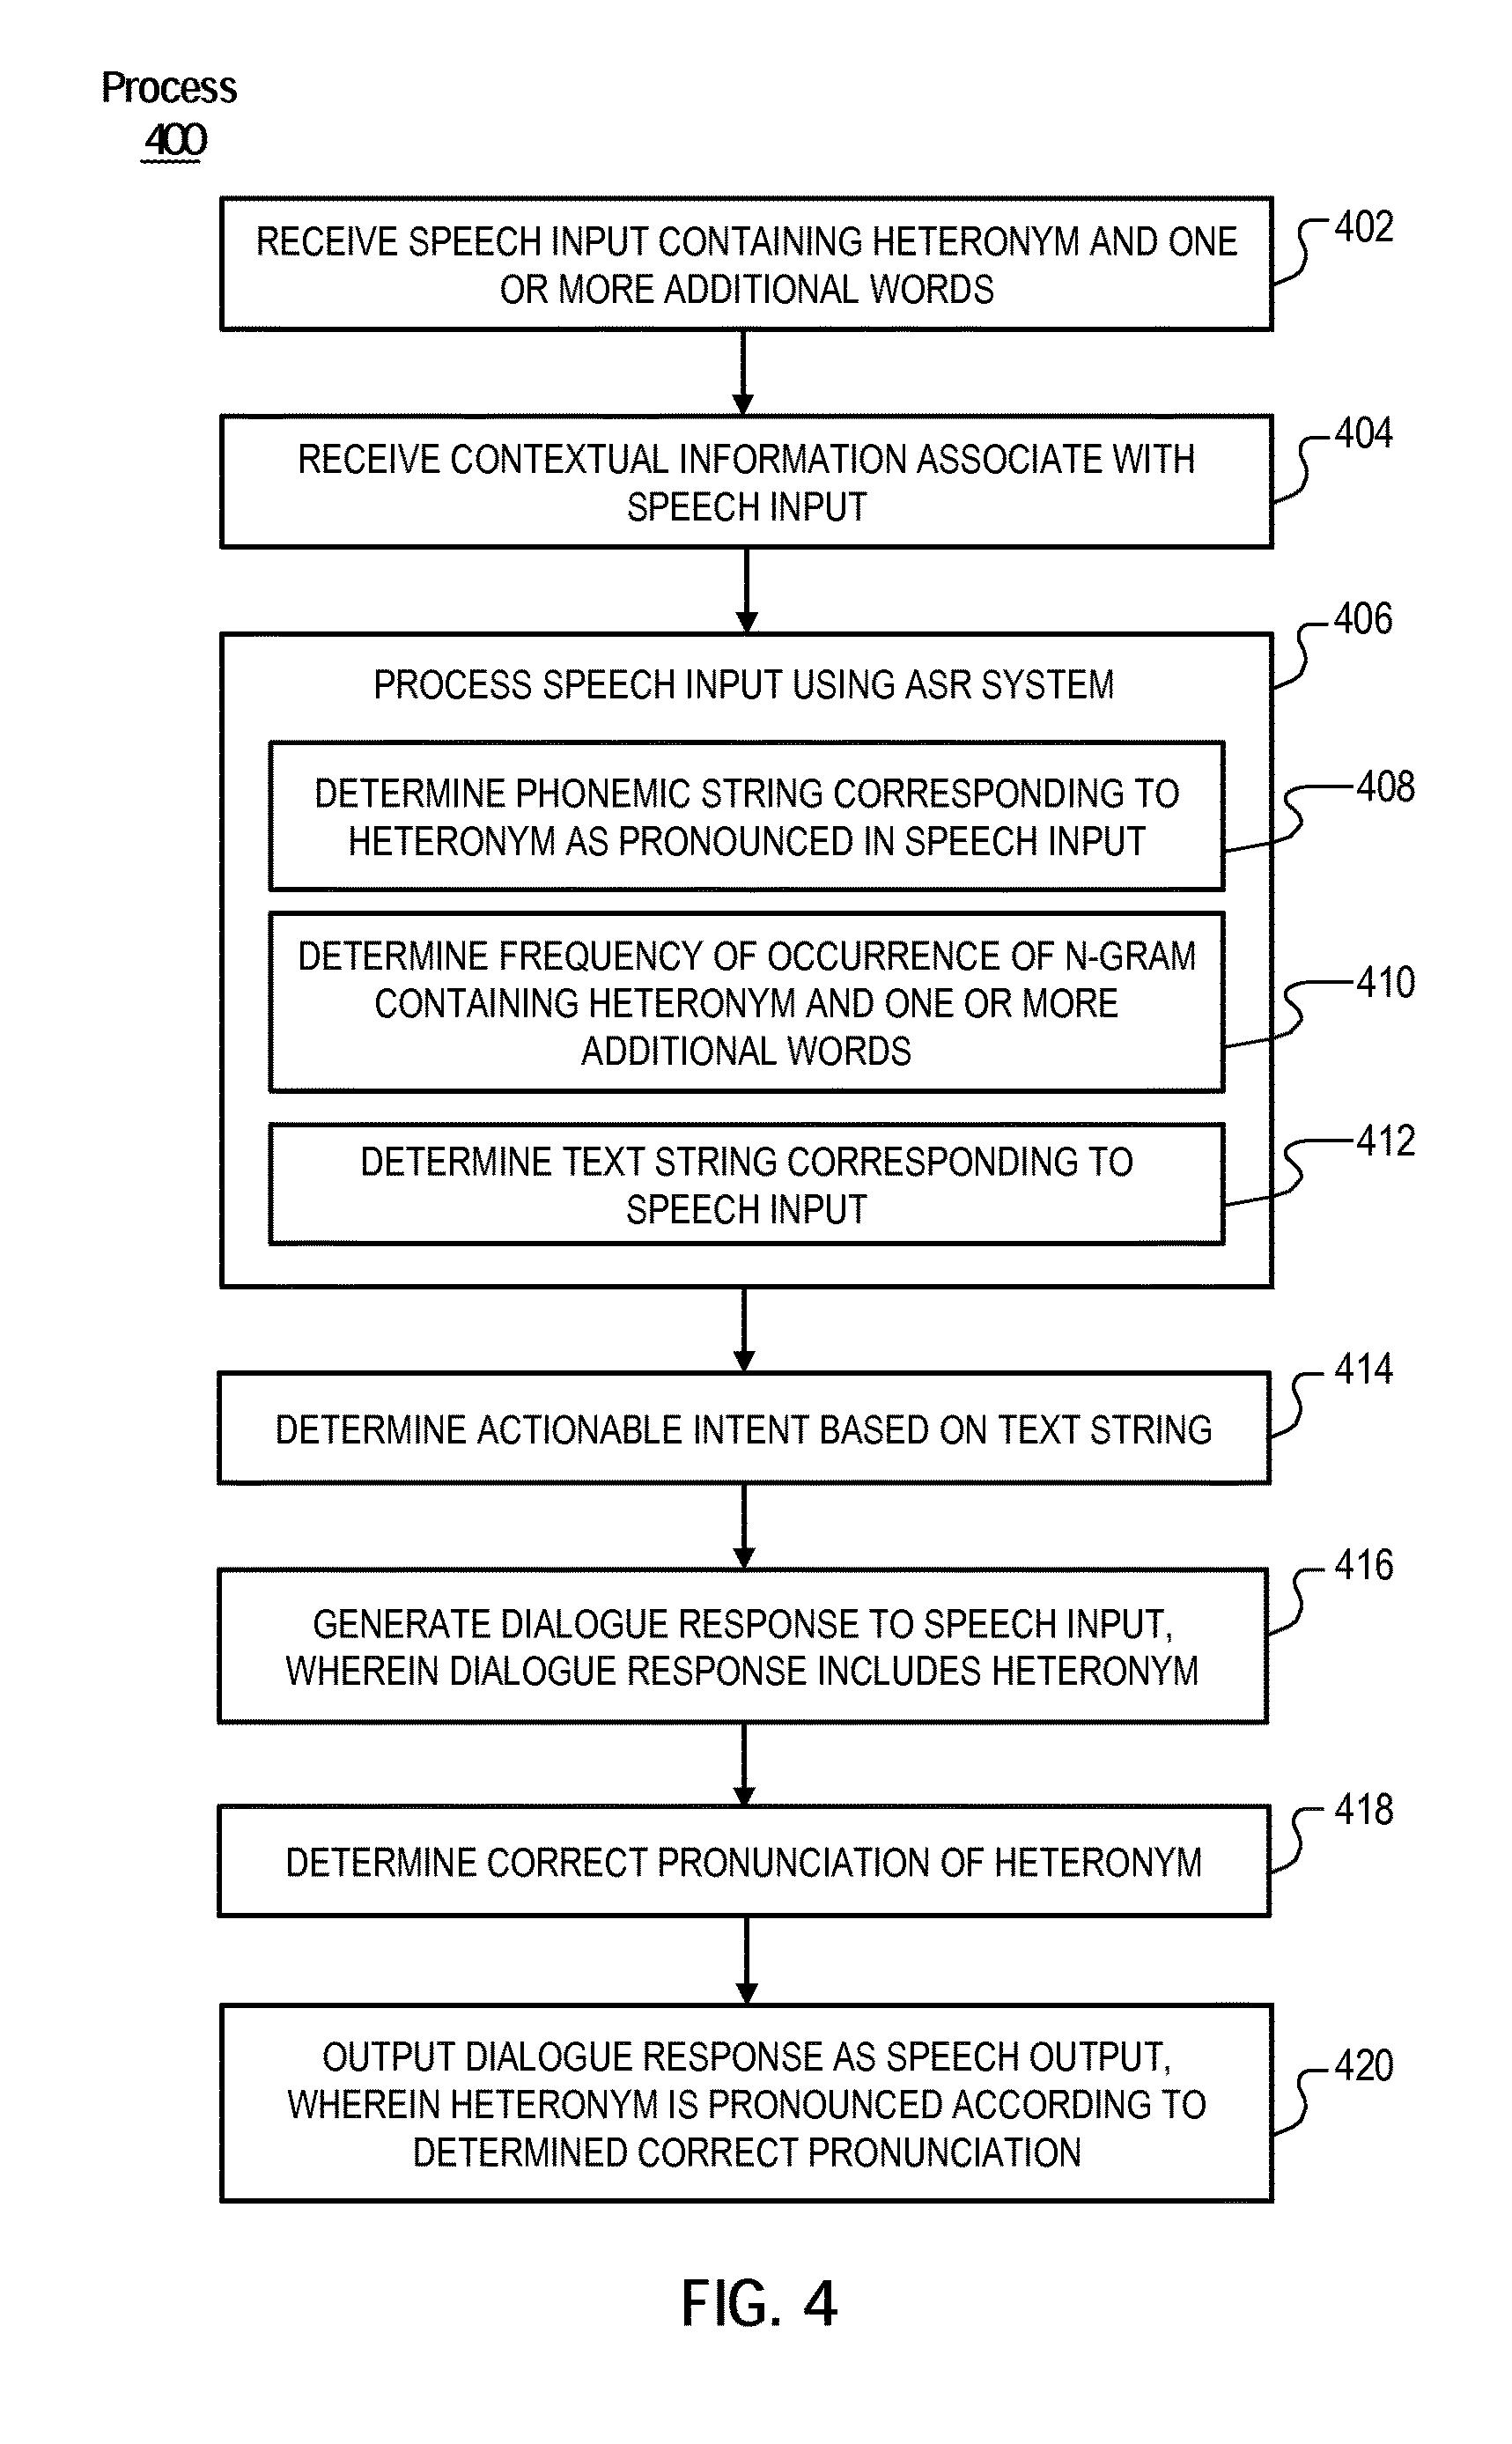 Patent US 9,711,141 B2